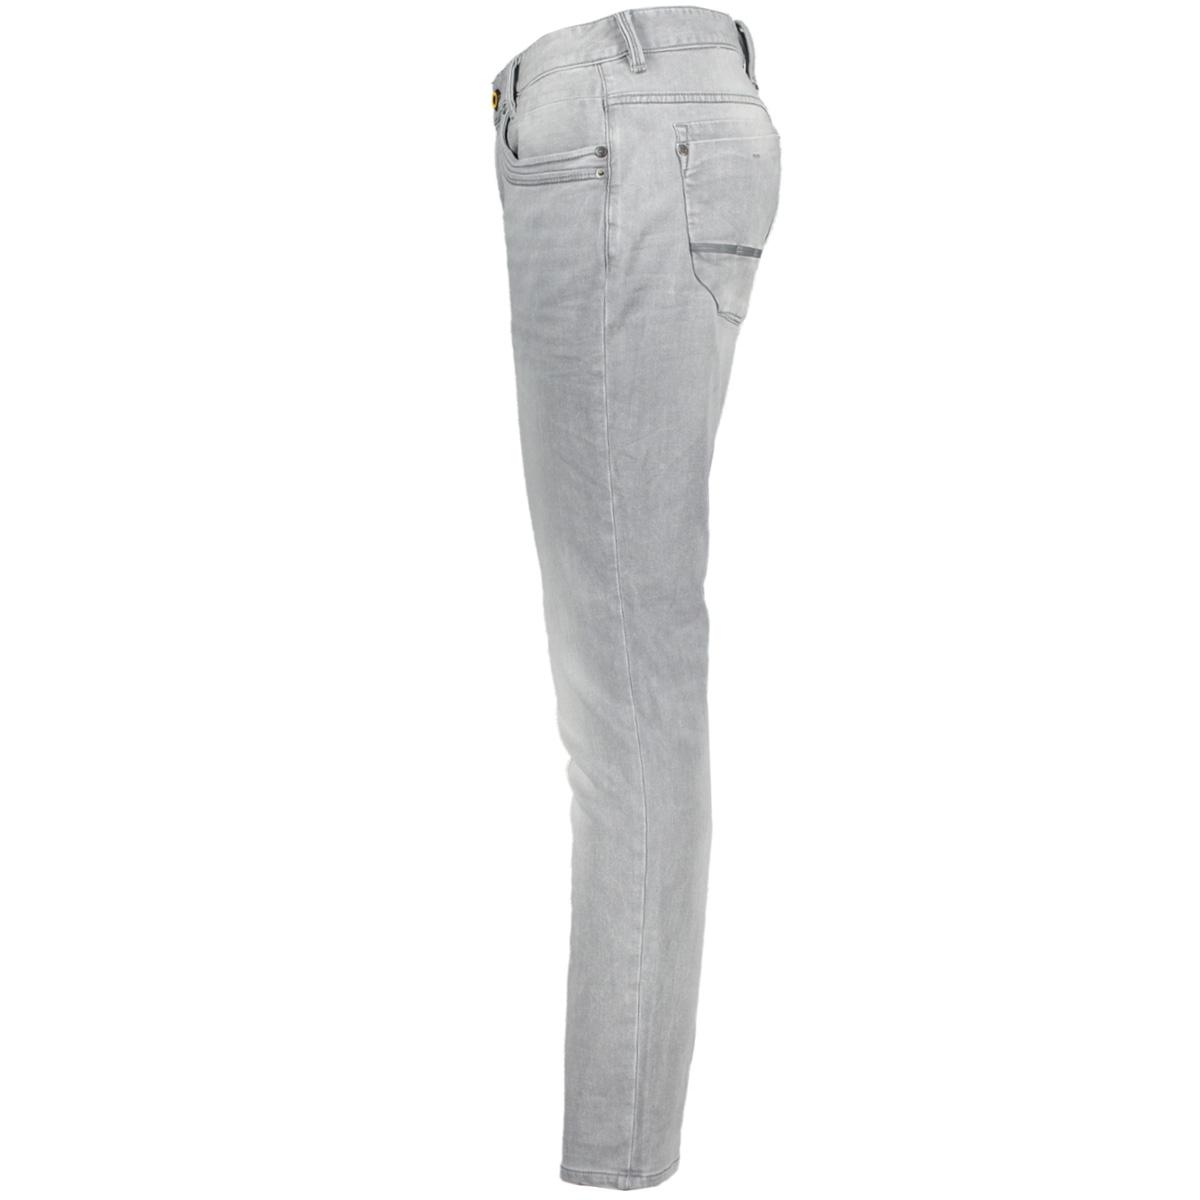 ptr182650-fgs  skymaster pme legend jeans fgs